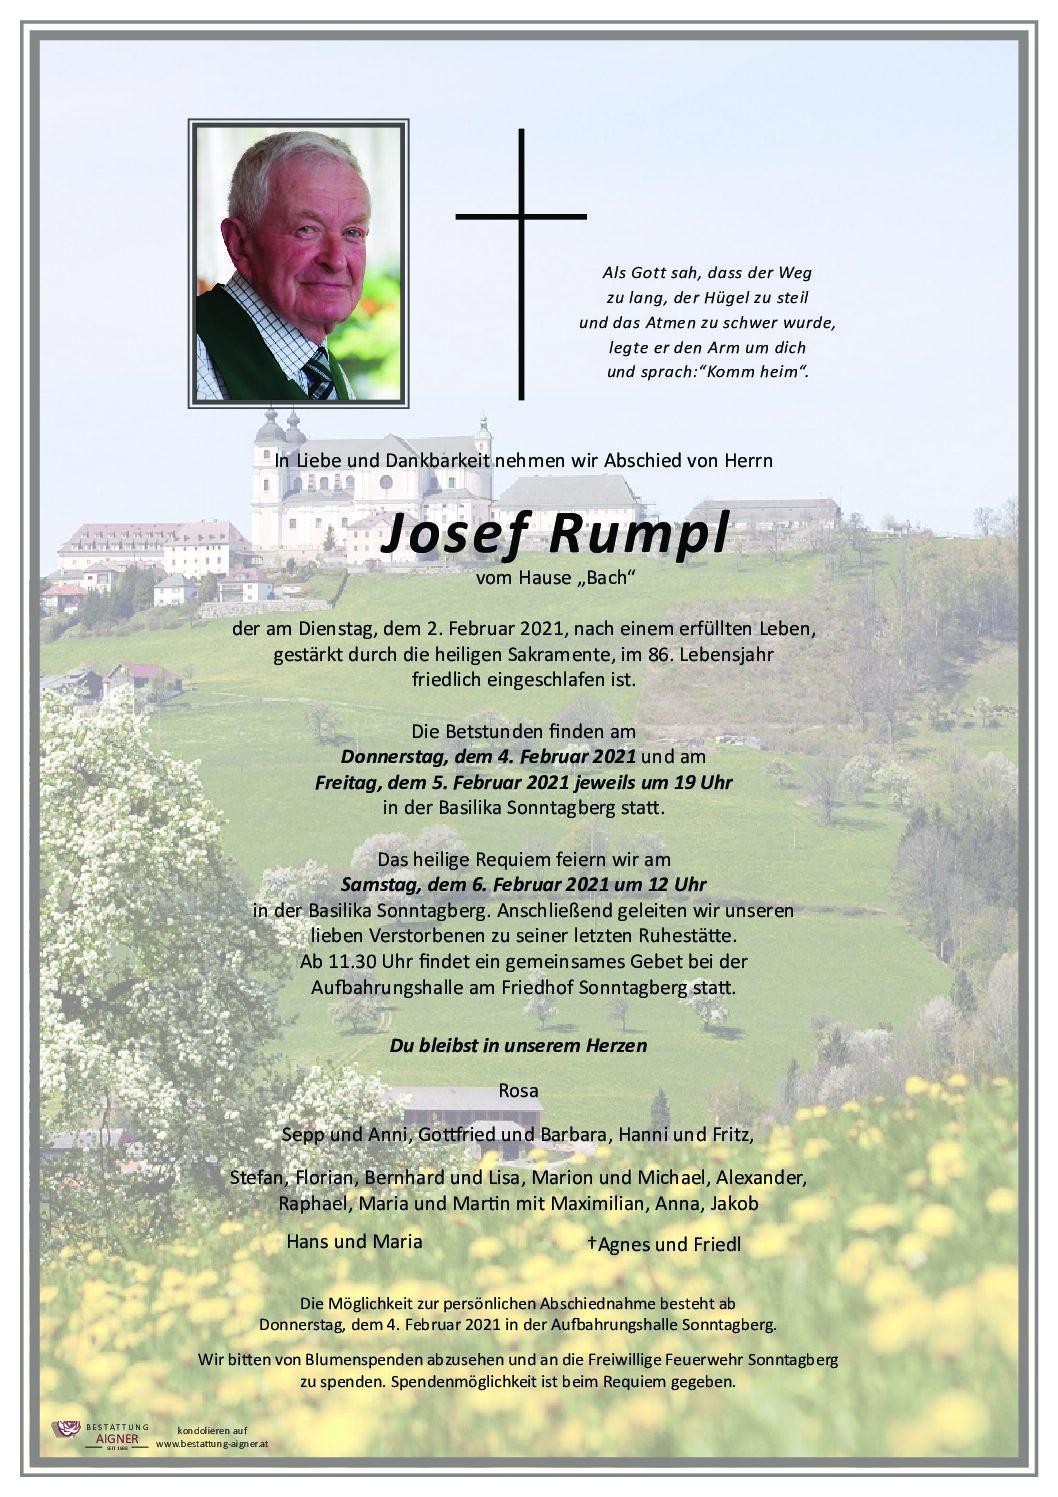 Josef Rumpl